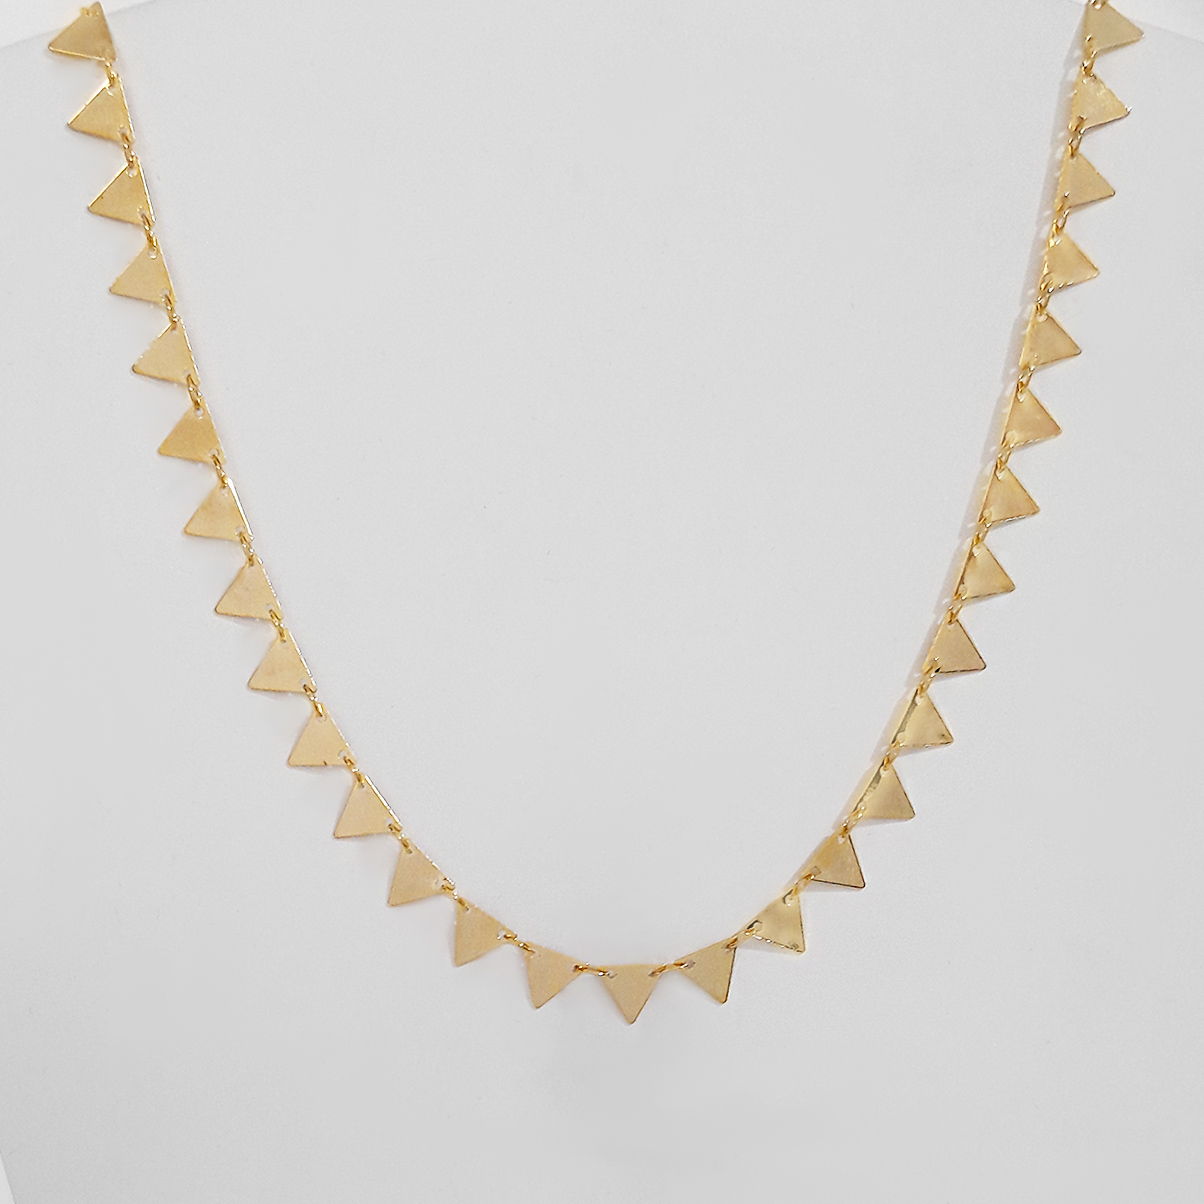 Colar 40cm Triângulos Folheado Ouro 18k  - Lunozê Joias